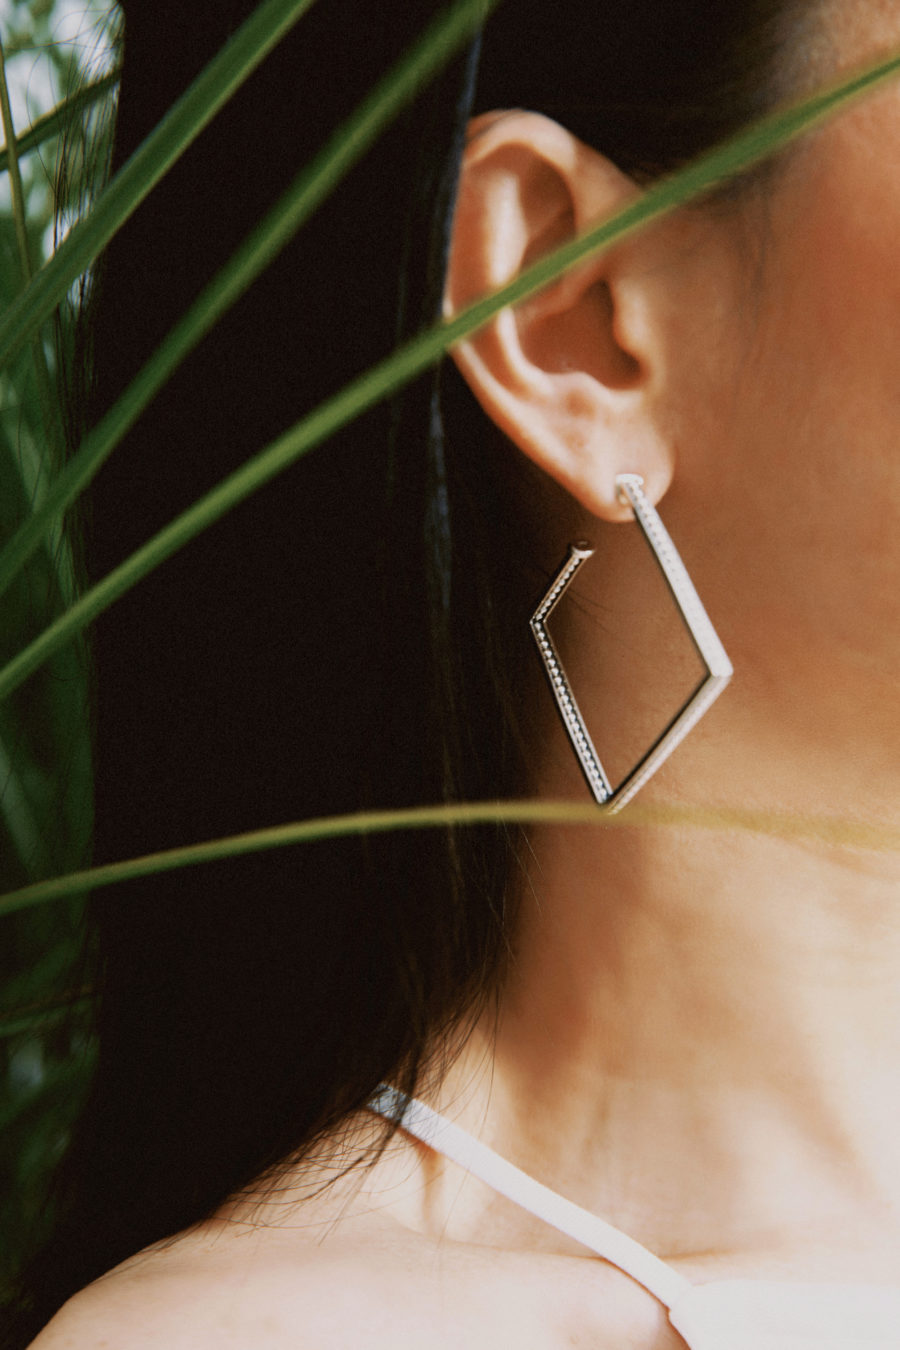 jessica wang wearing lagos fine jewelry bracelet and earrings // Jessica Wang - Notjessfashion.com